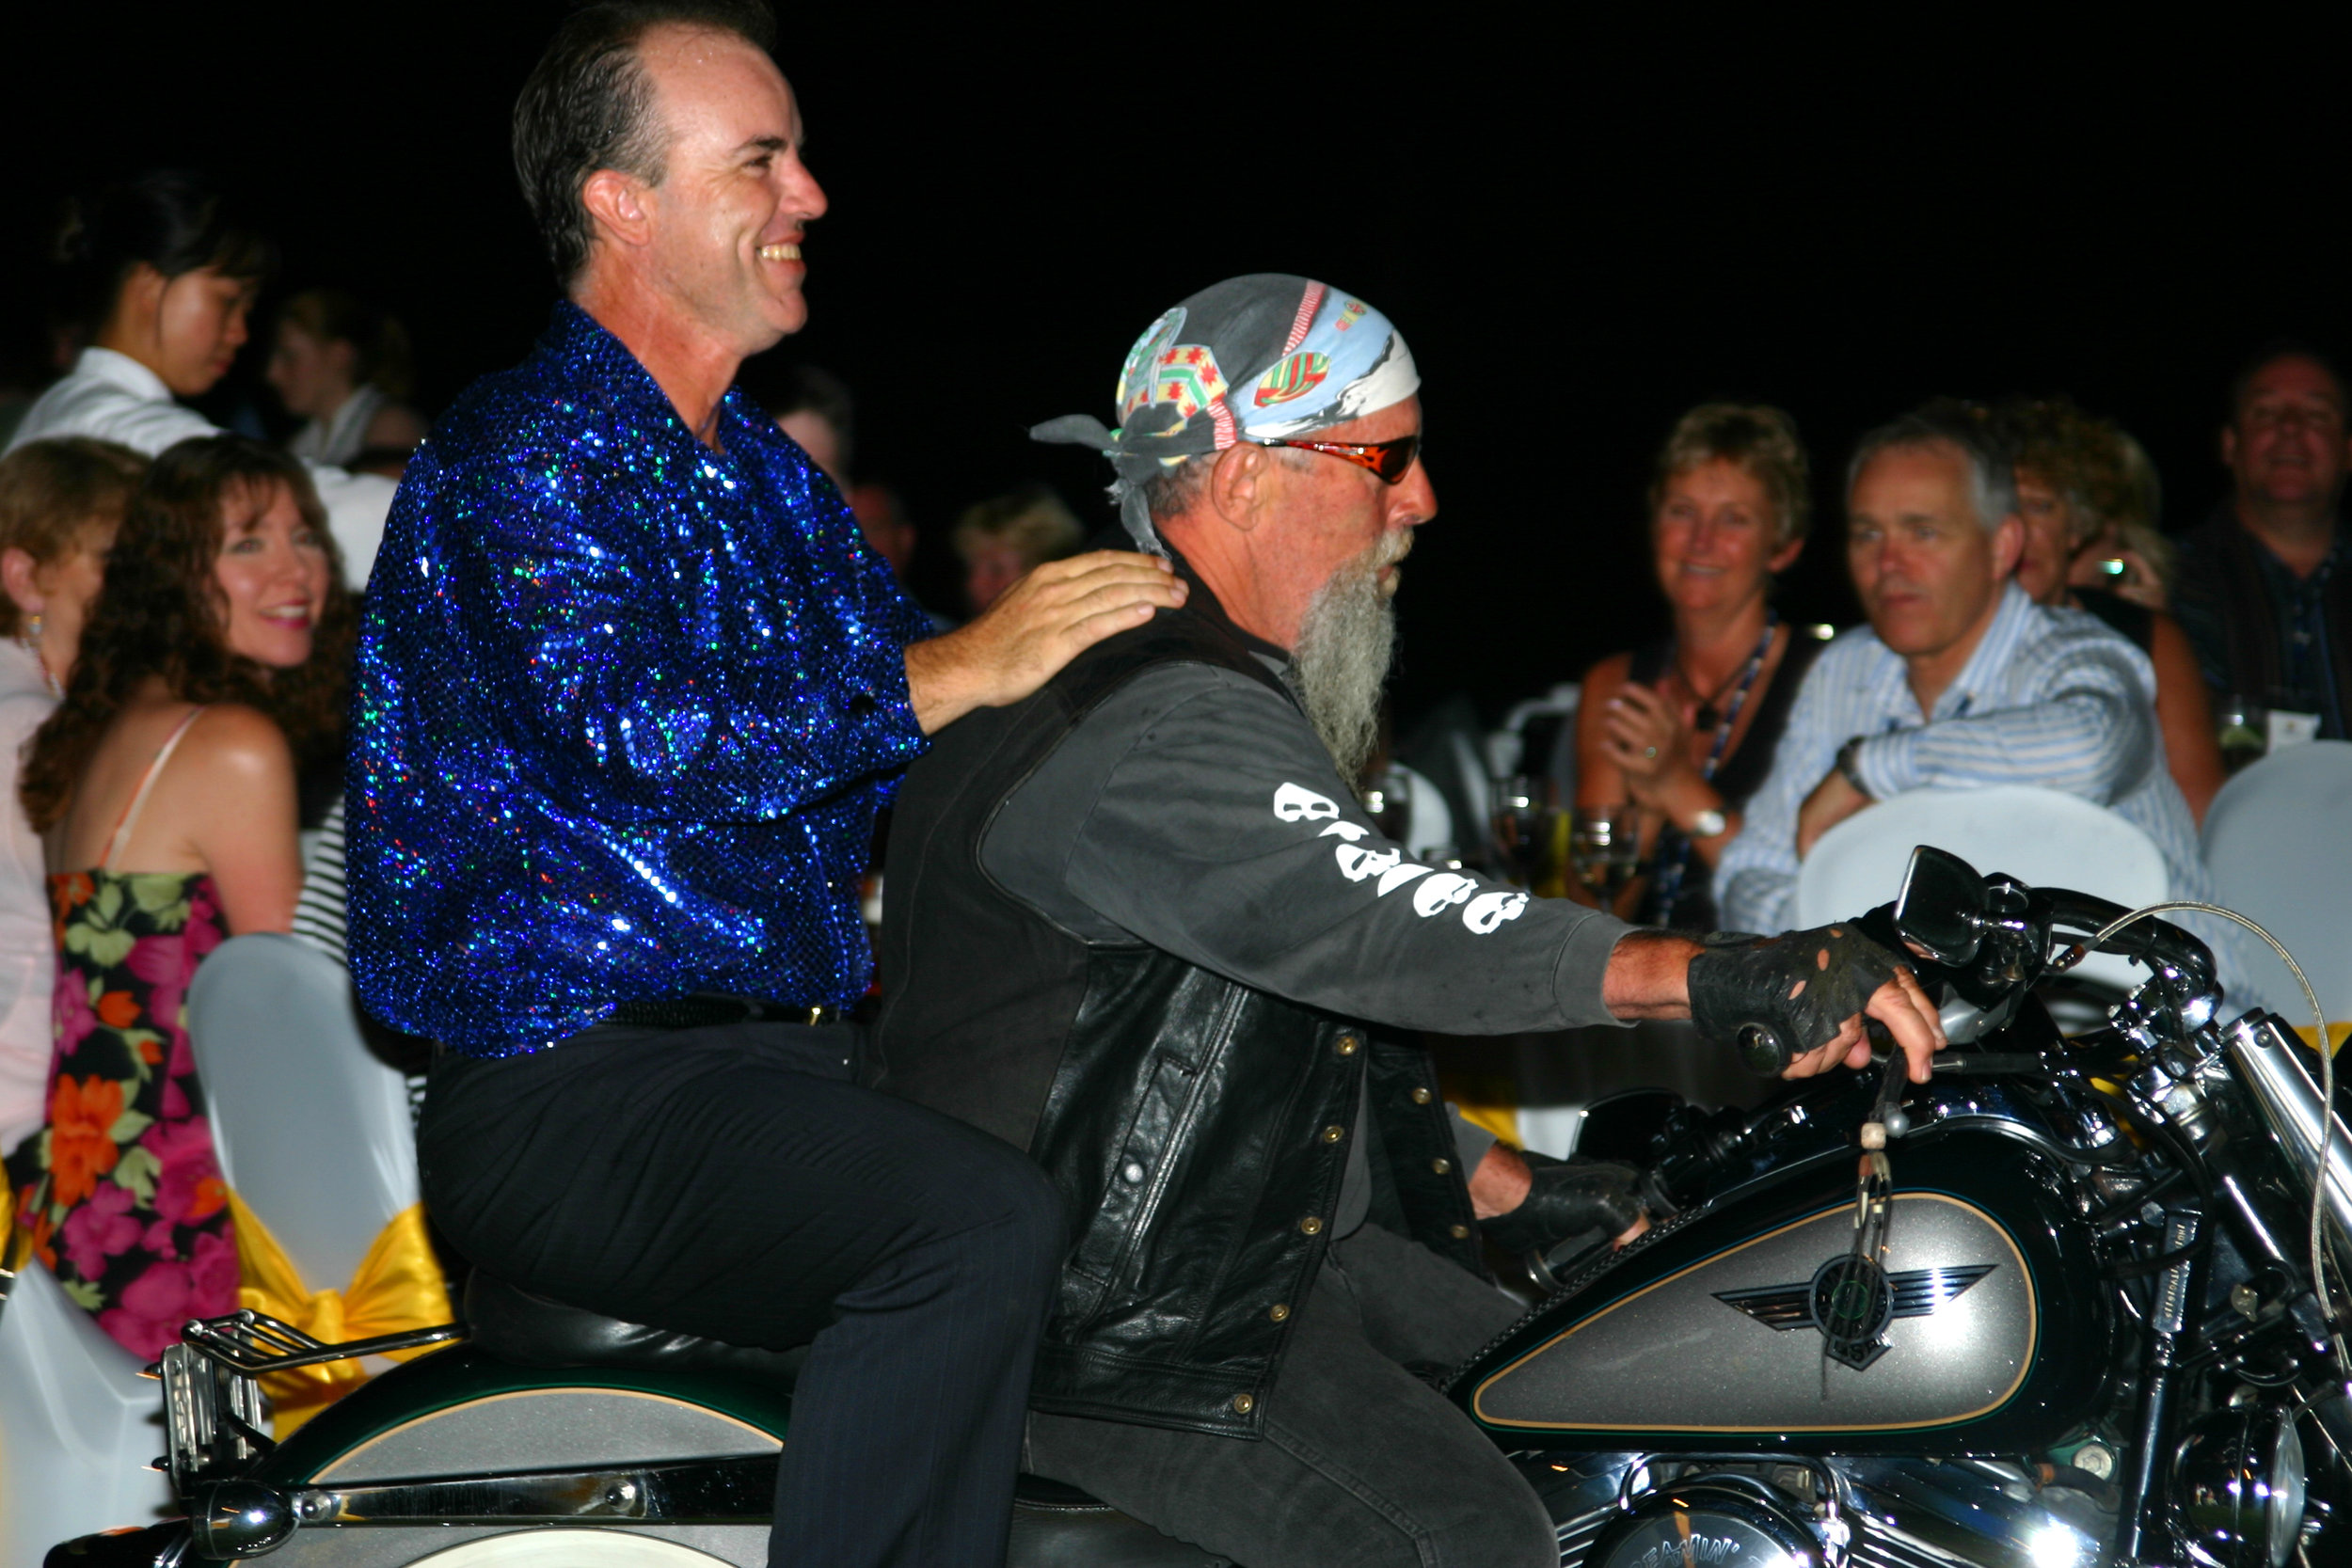 Riding on Harley.jpg